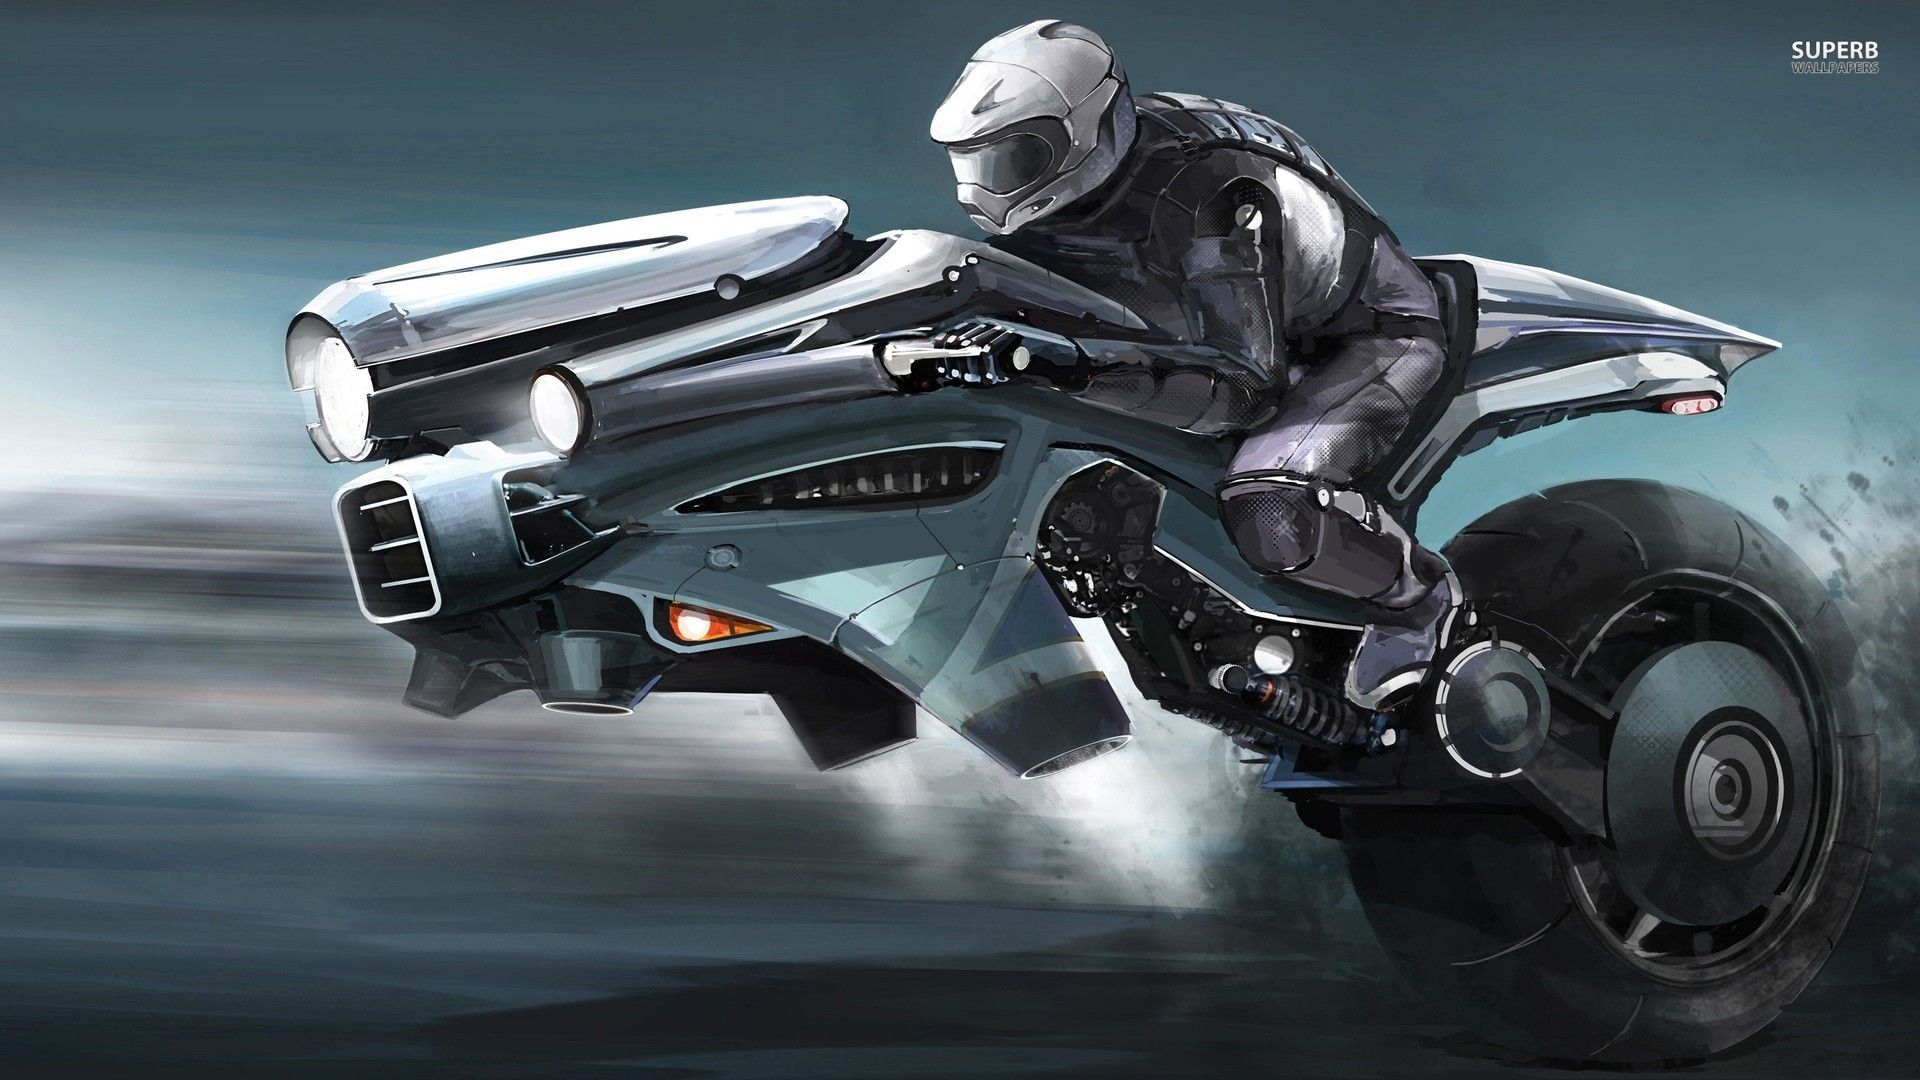 Riding the futuristic bike wallpaper